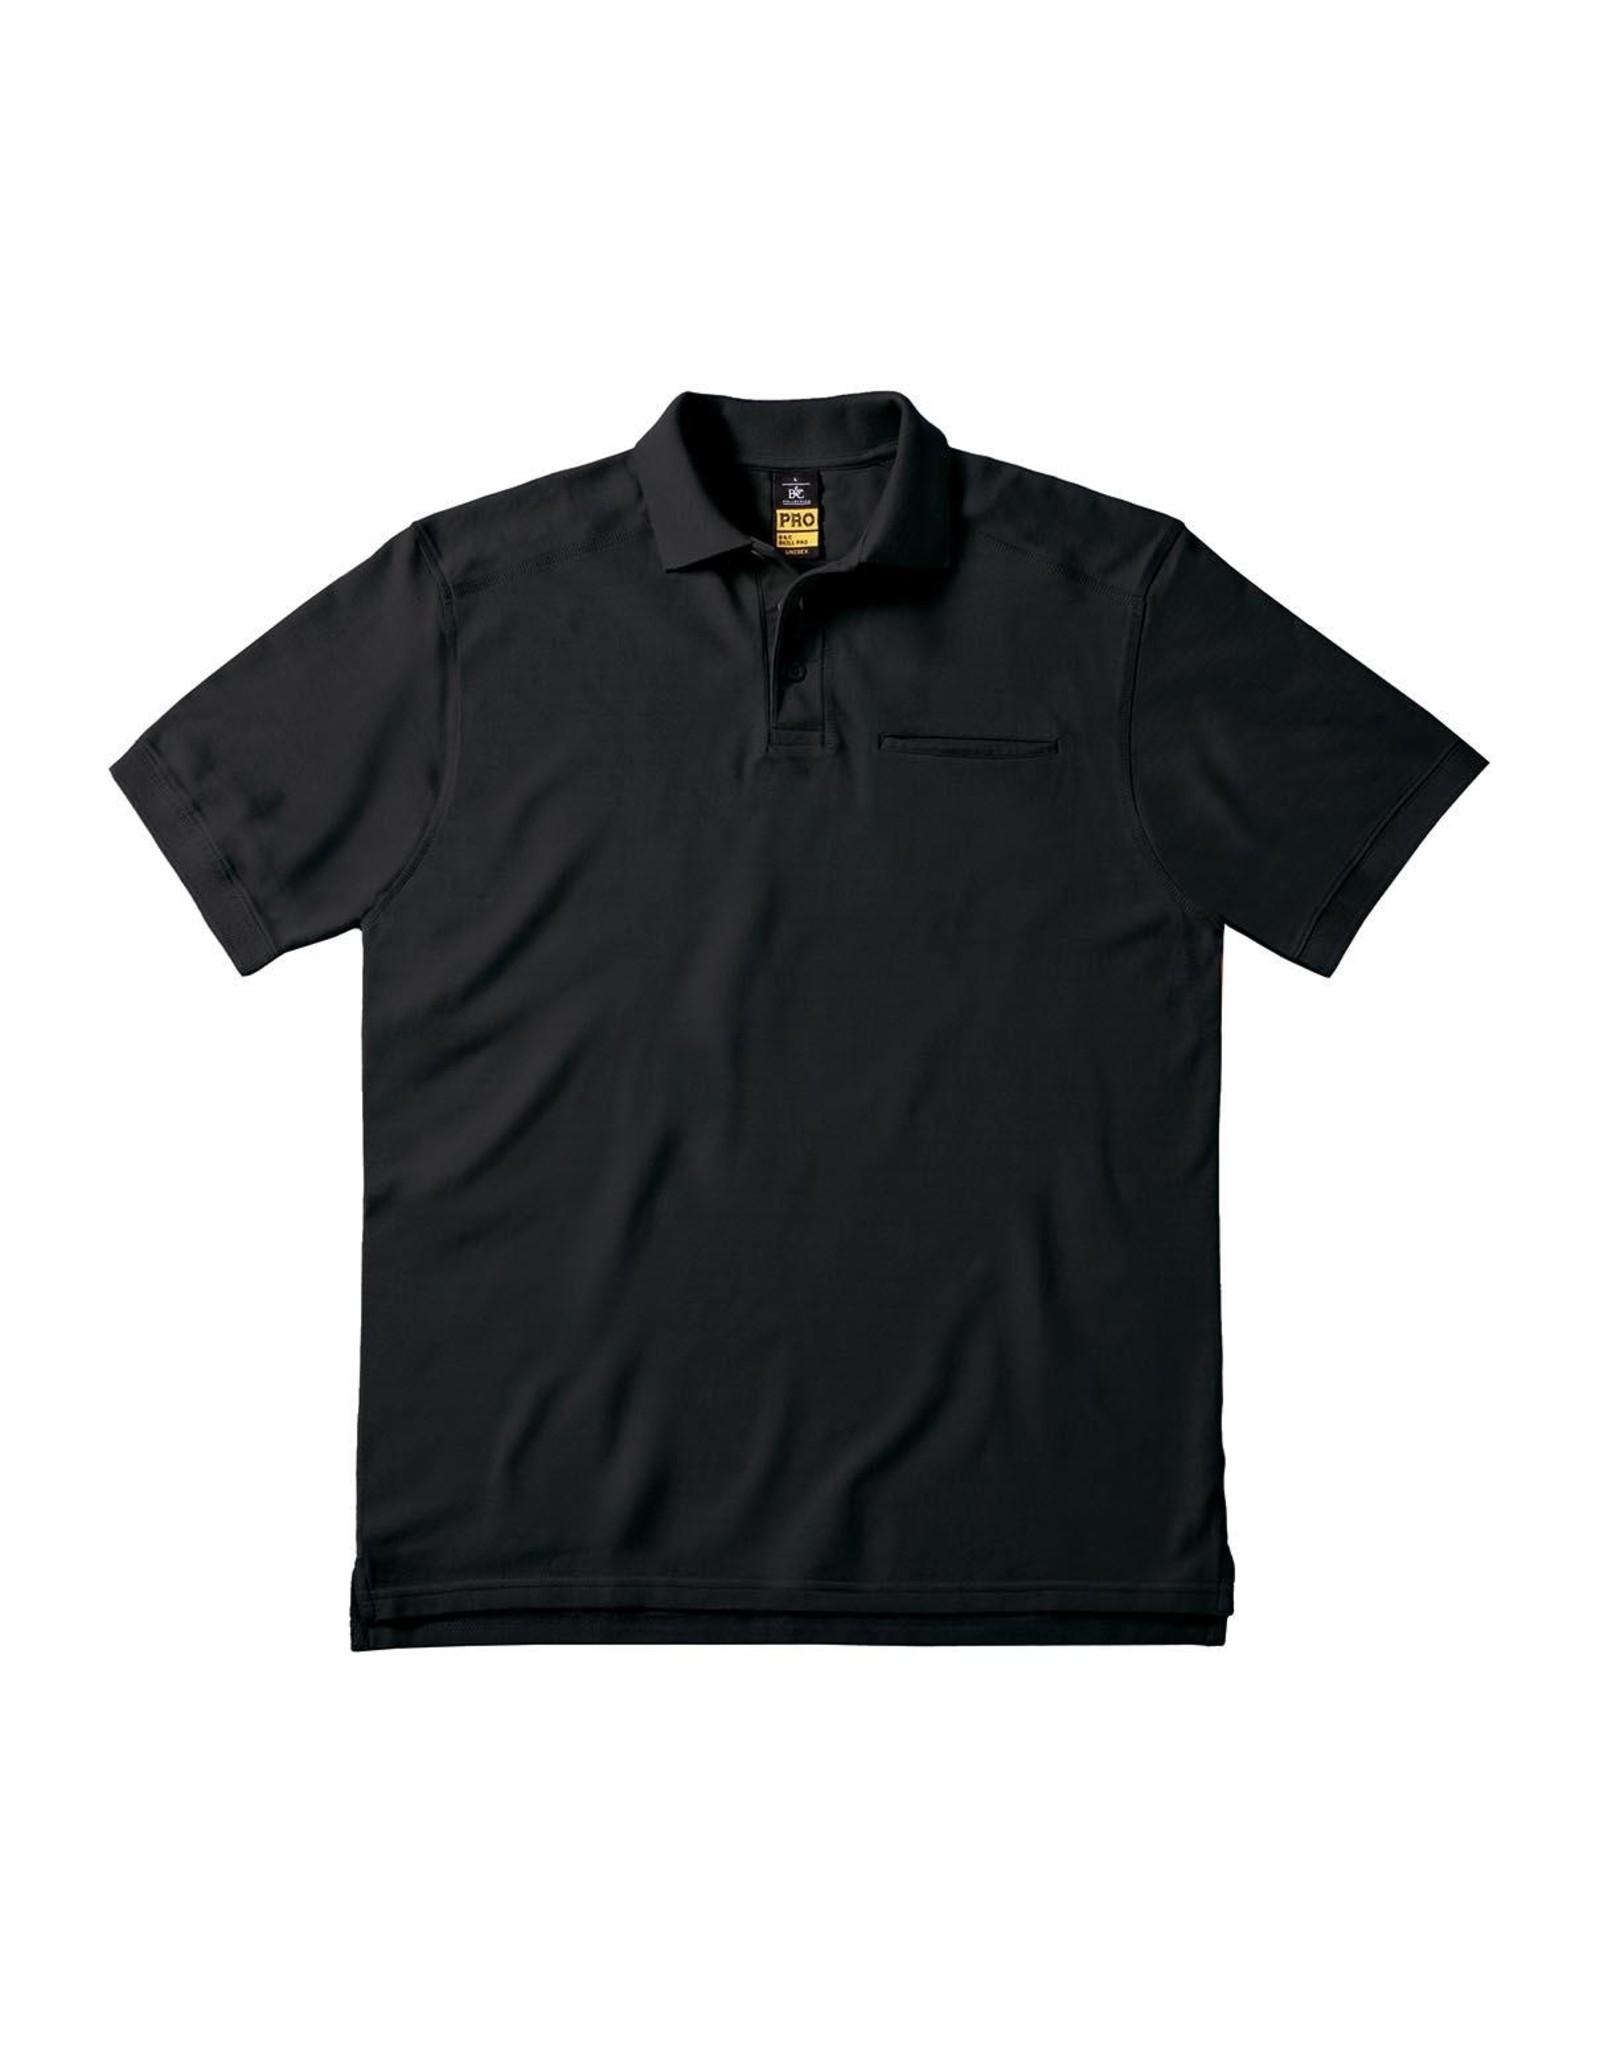 B&C Workwear POLOSHIRT katoen zwart